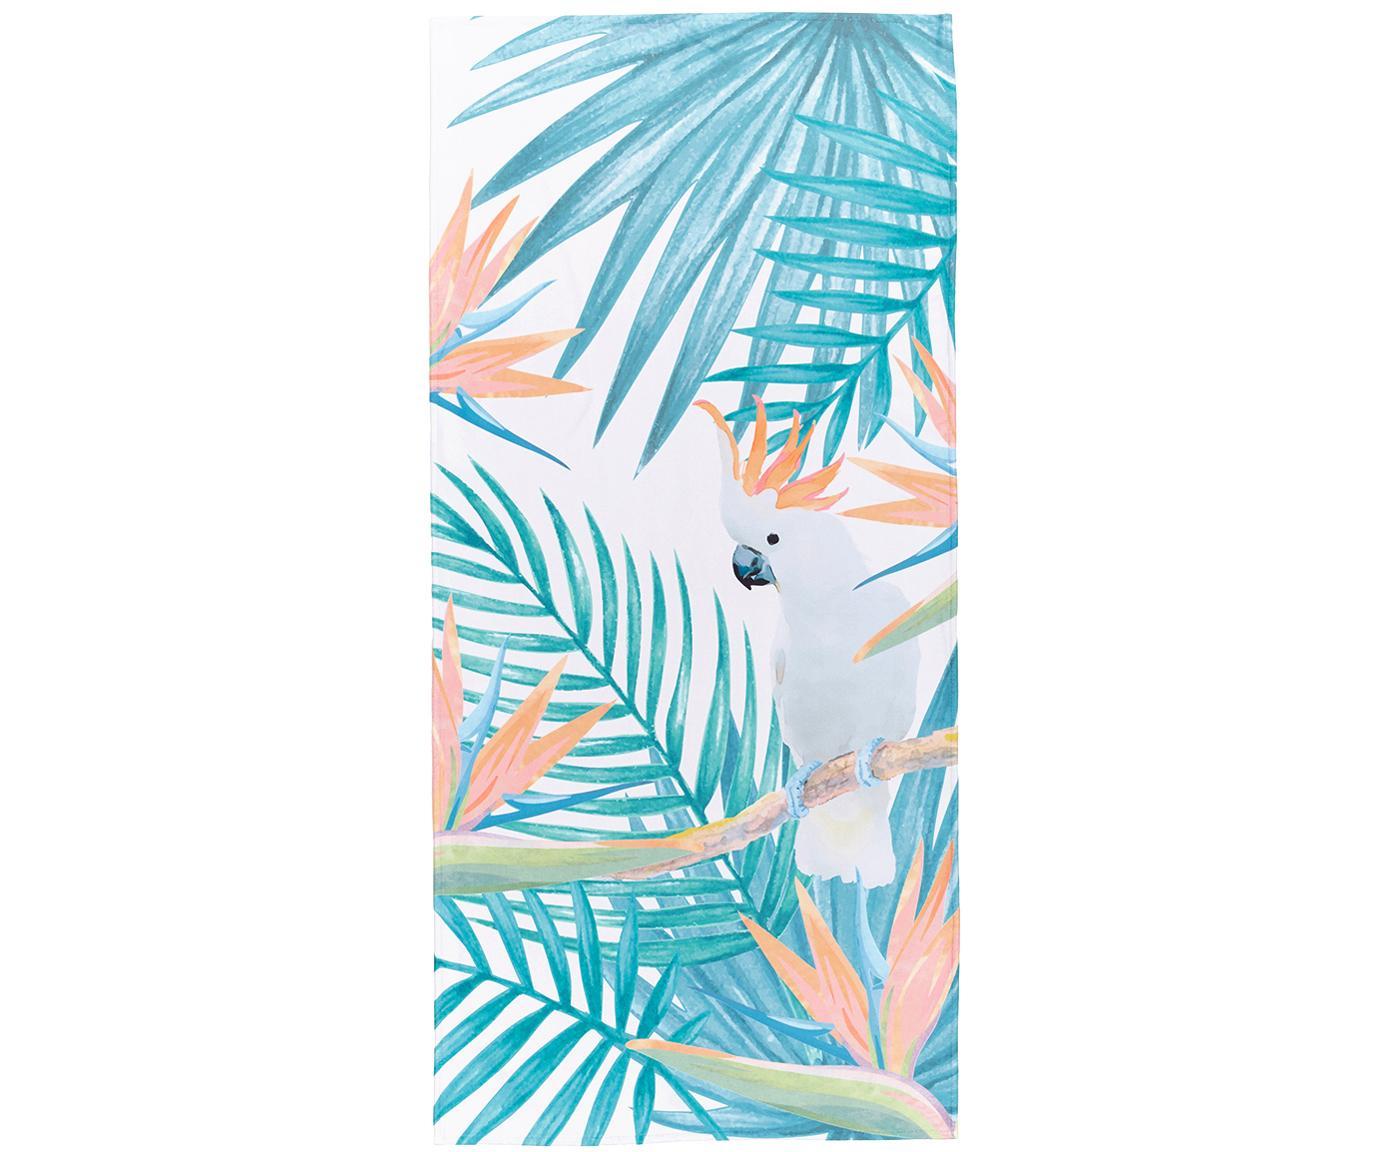 Toalla de playa ligera Tropic, 55%poliéster, 45%algodón Gramaje ligero 340g/m², Beige, verde, naranja, An 70 x L 150 cm